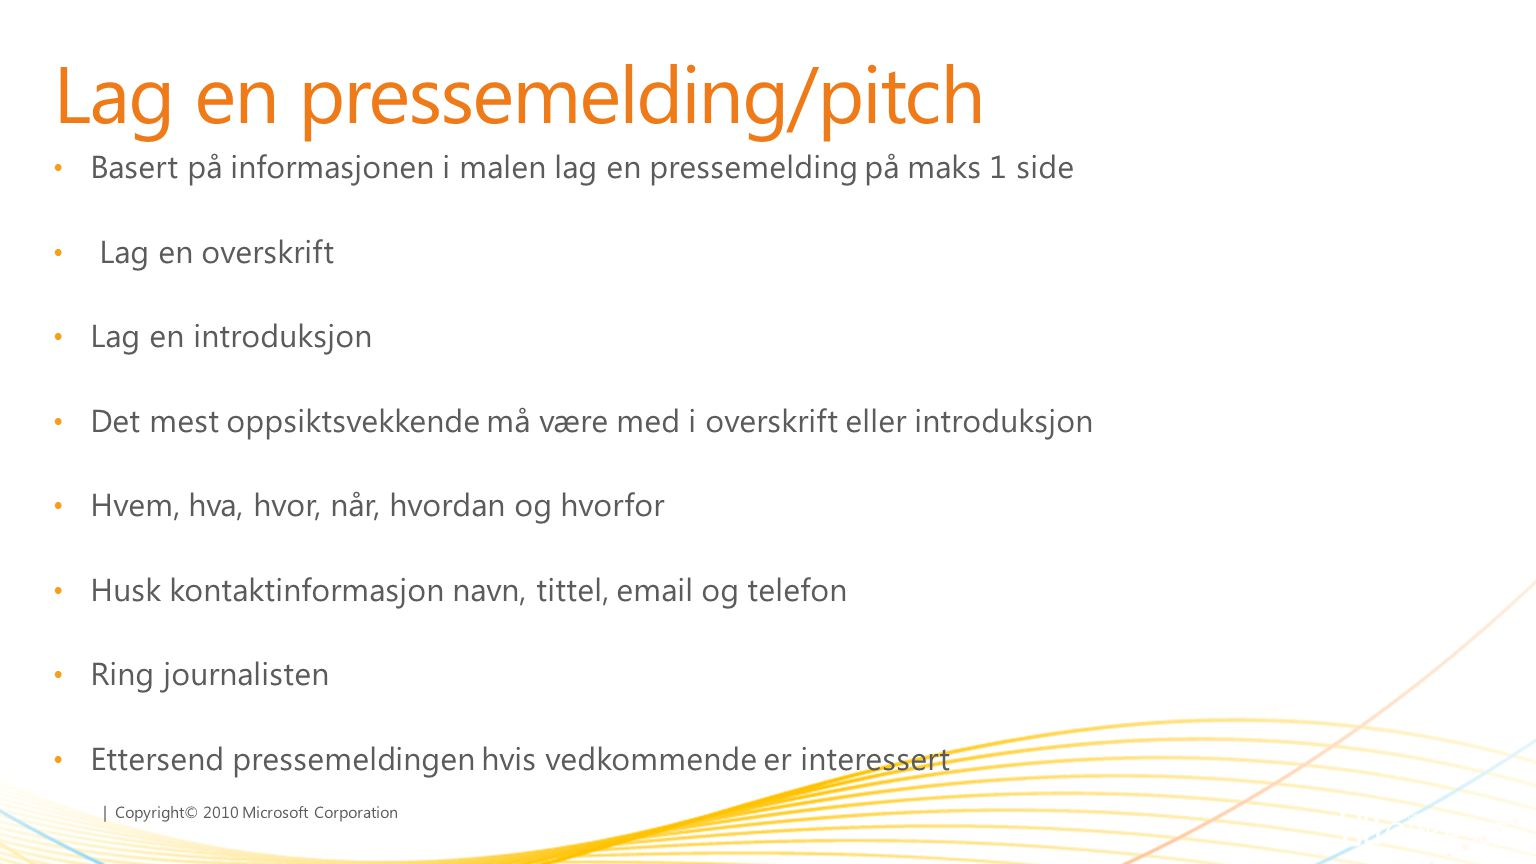 Lag en pressemelding/pitch